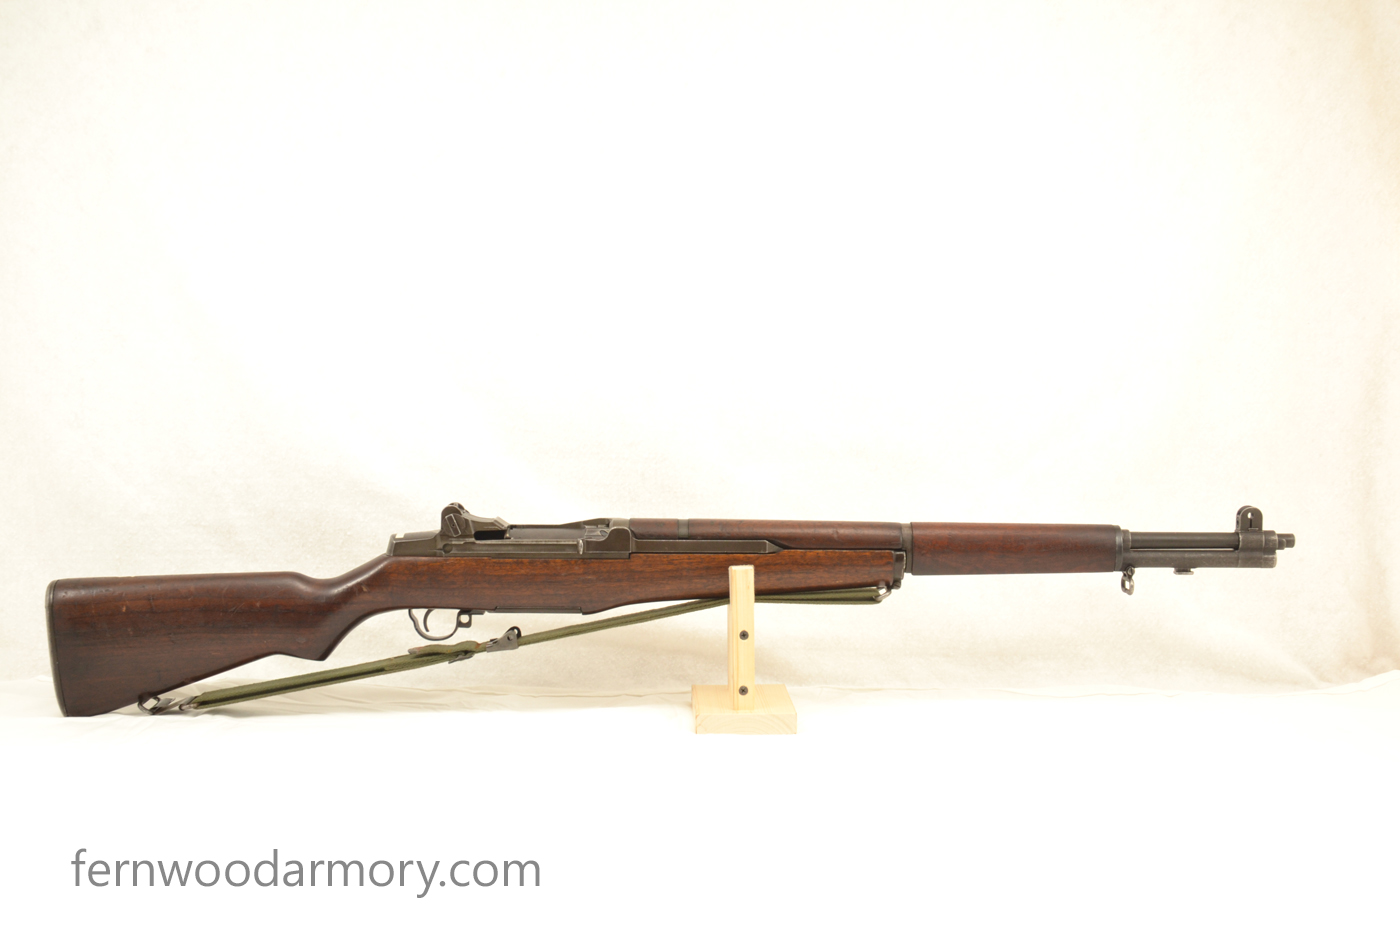 World War Two Issue Springfield Armory M1 Garand